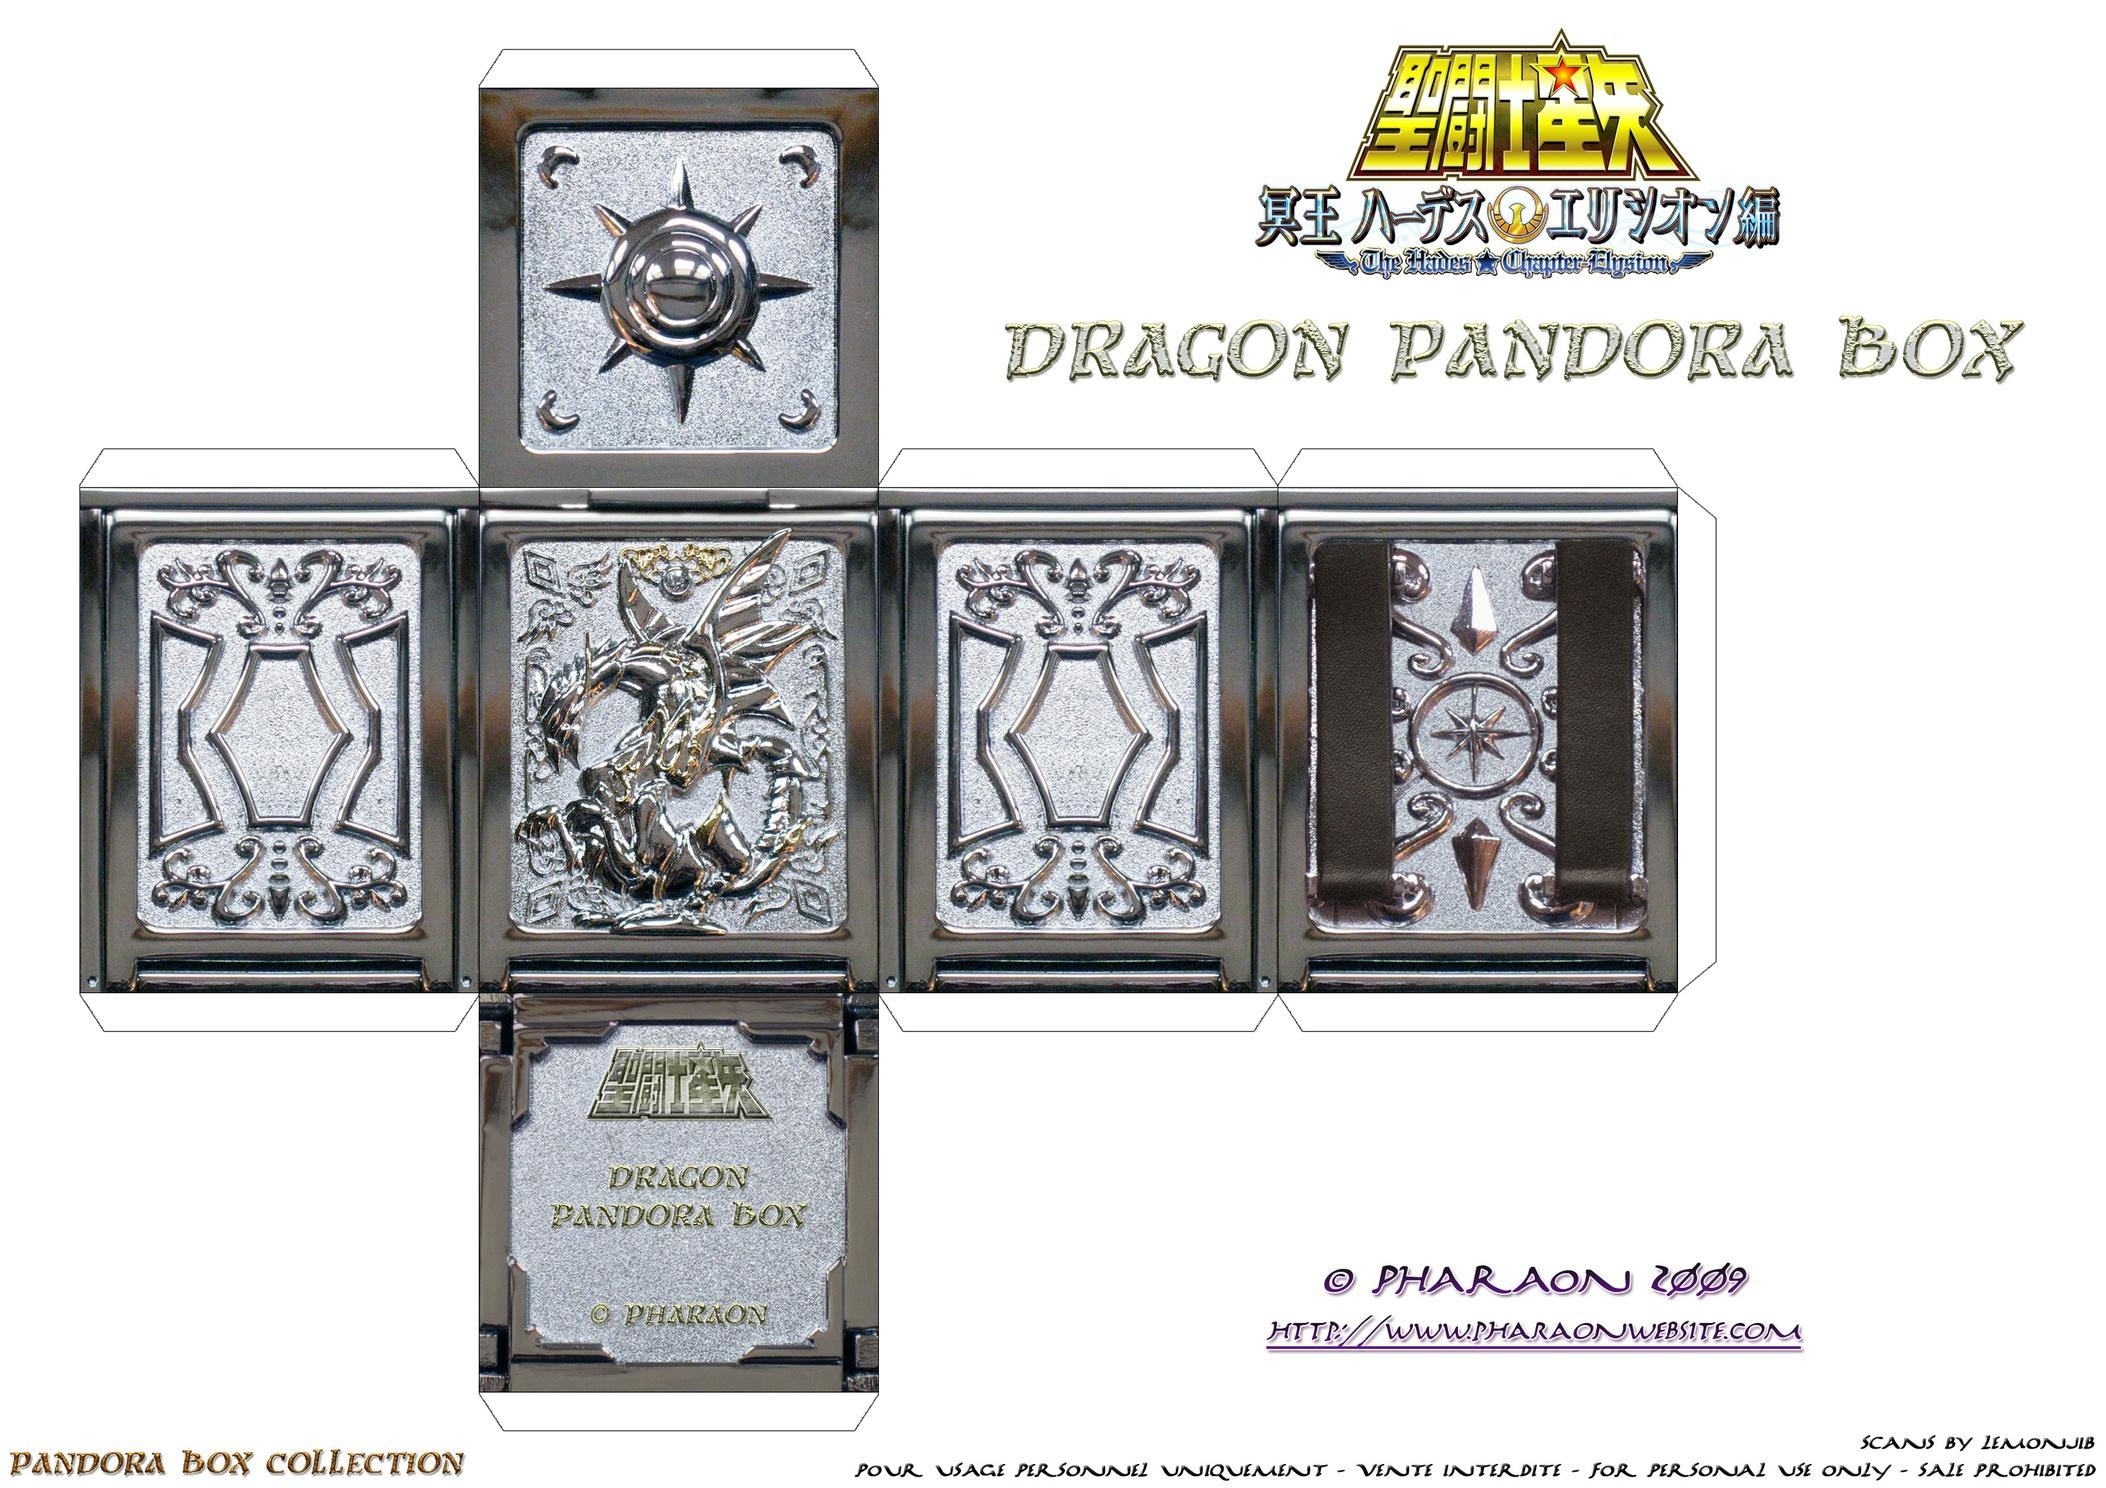 Pandora Boxes Pharaon Website